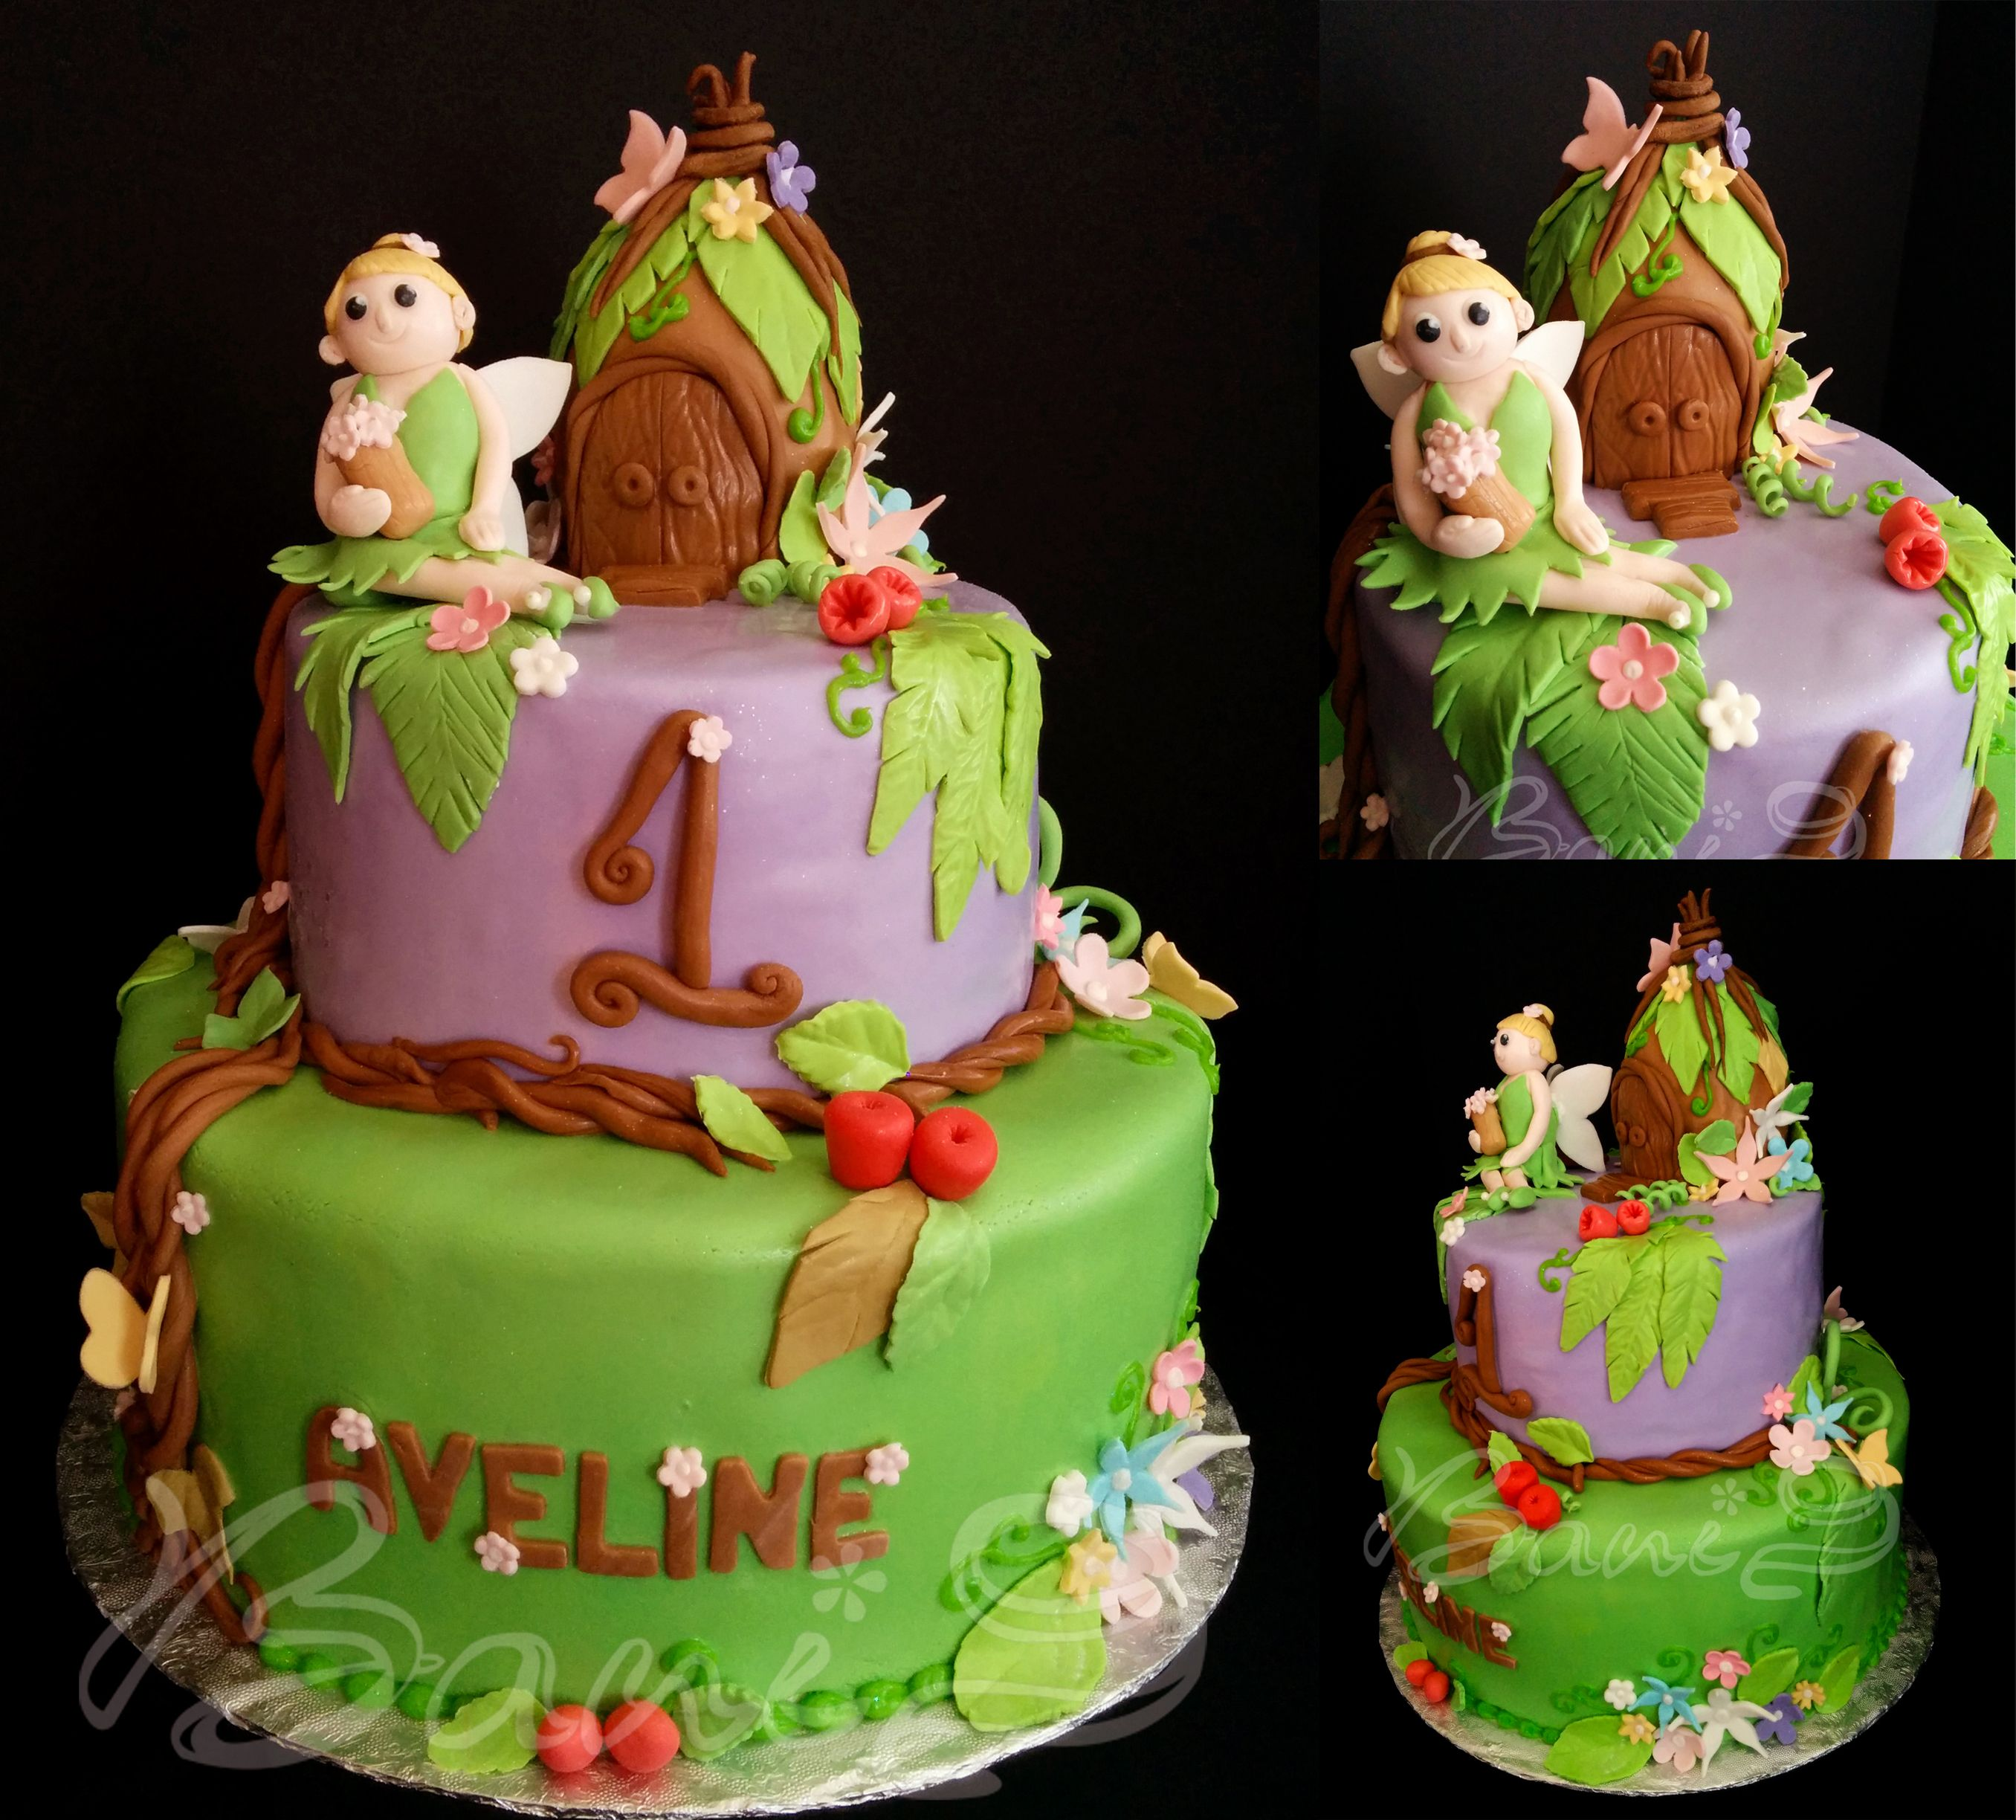 Tinkerbell Theme Cake 1st Birthday Cake Tiered Cakes Pinterest